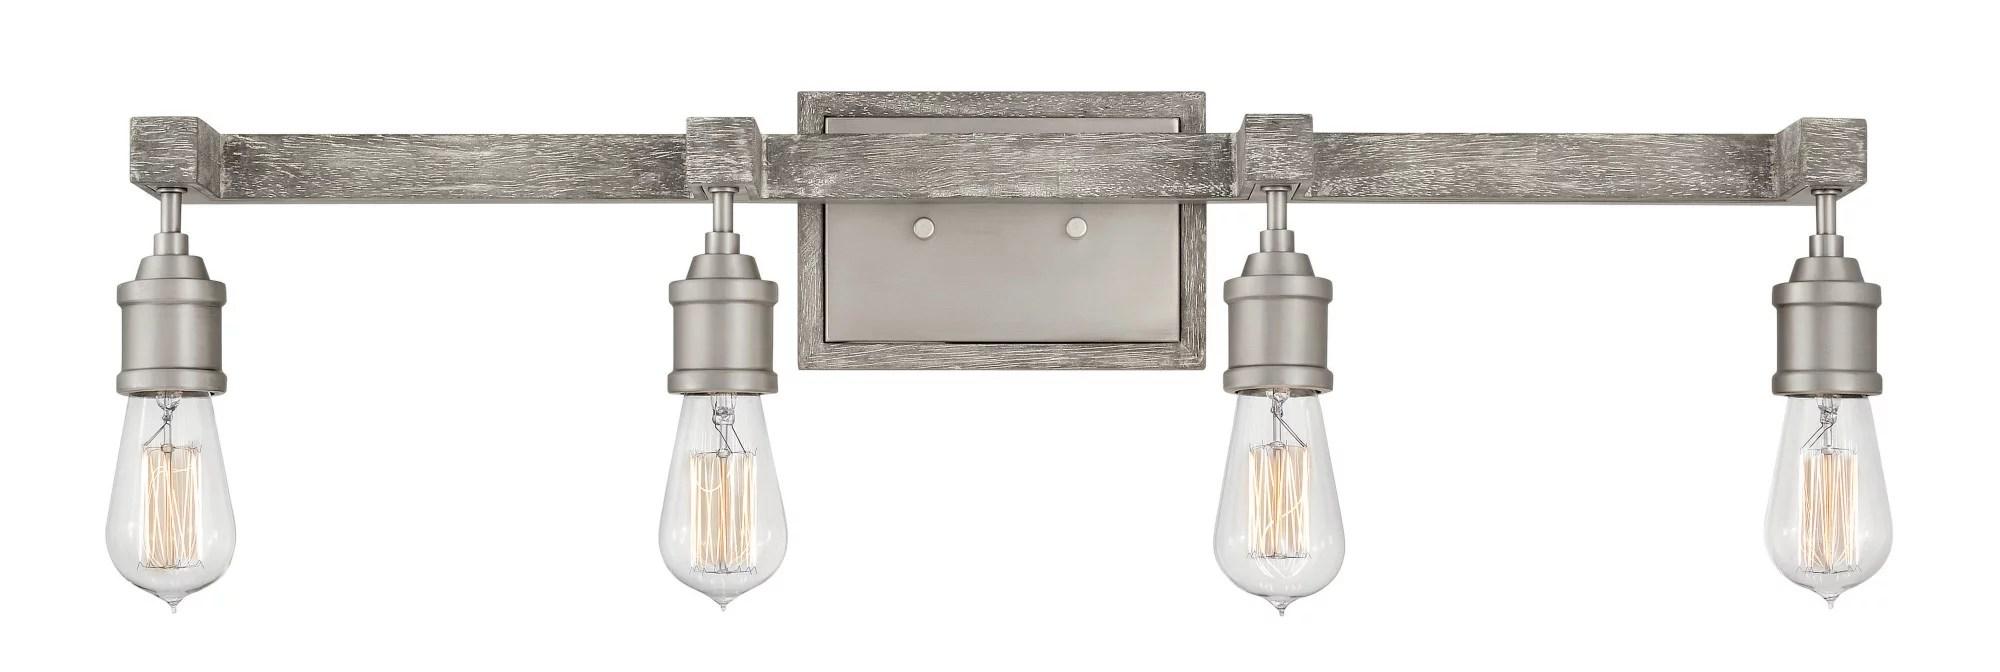 hinkley lighting 5764 4 light 32 wide bathroom vanity light from the denton collection